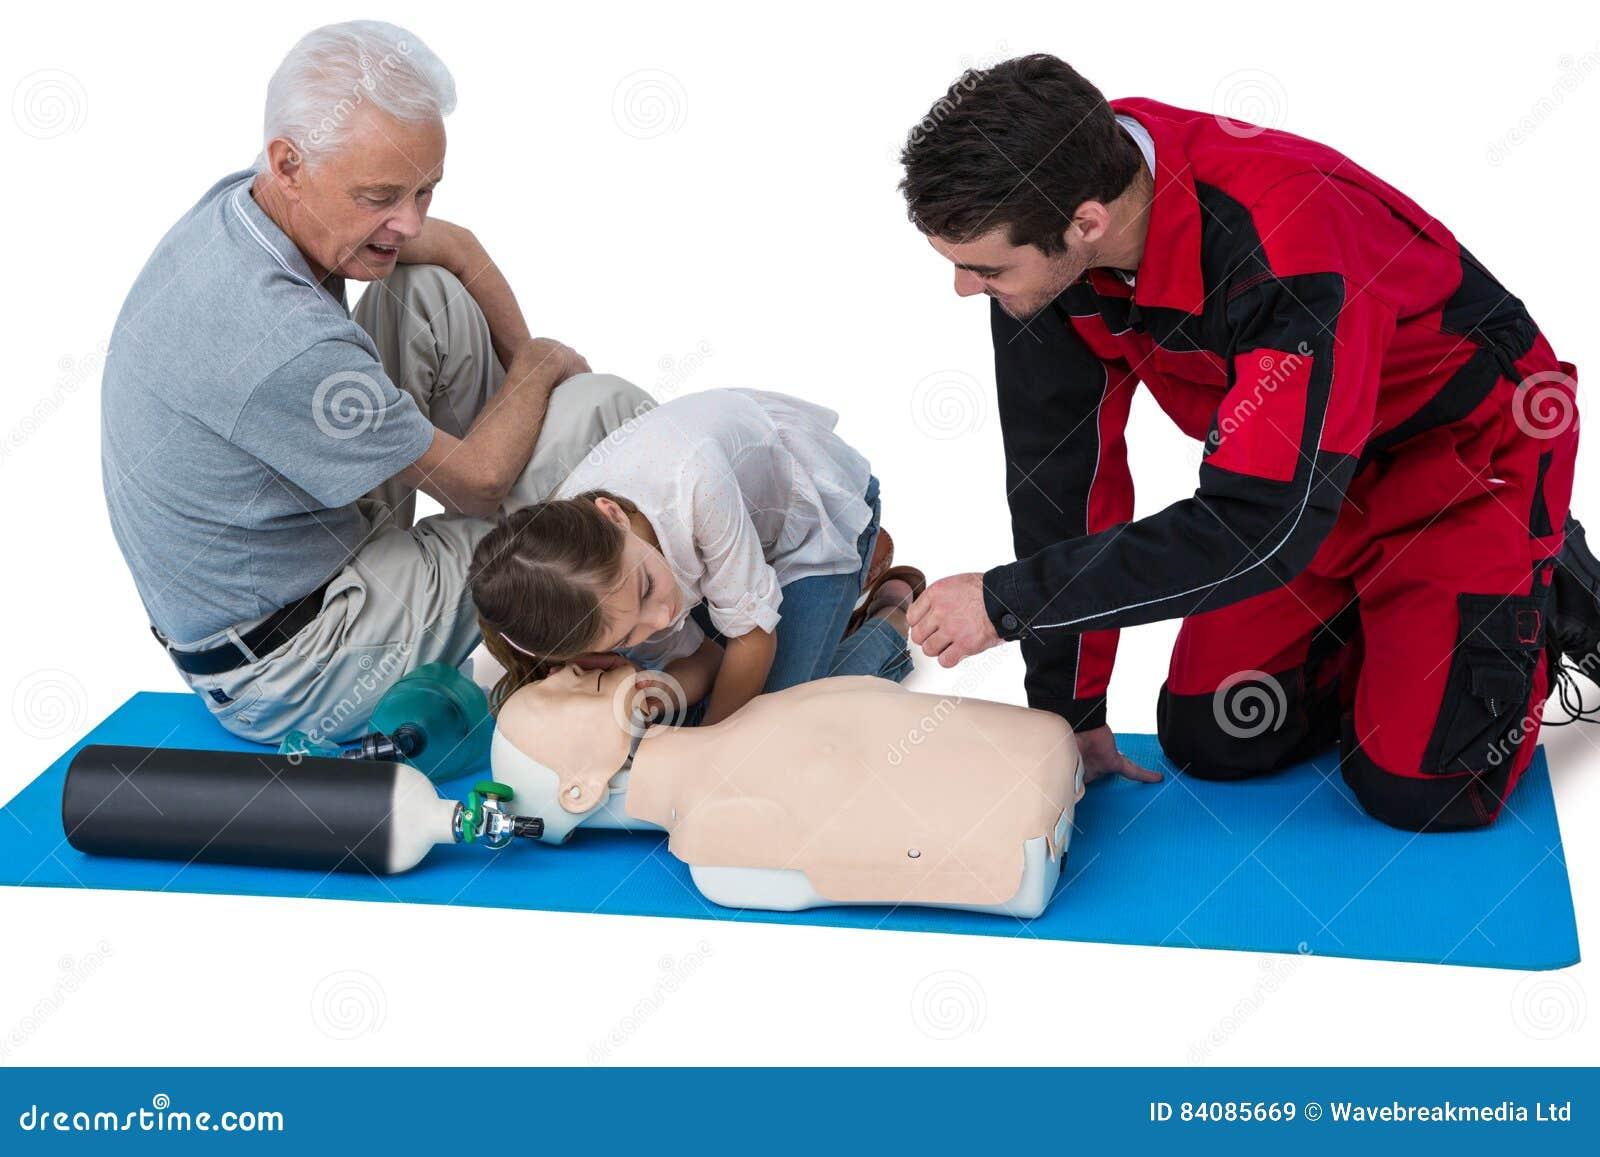 Download Paramedic Training Cardiopulmonary Resuscitation To Senior Man And Girl Stock Image - Image of mature, child: 84085669